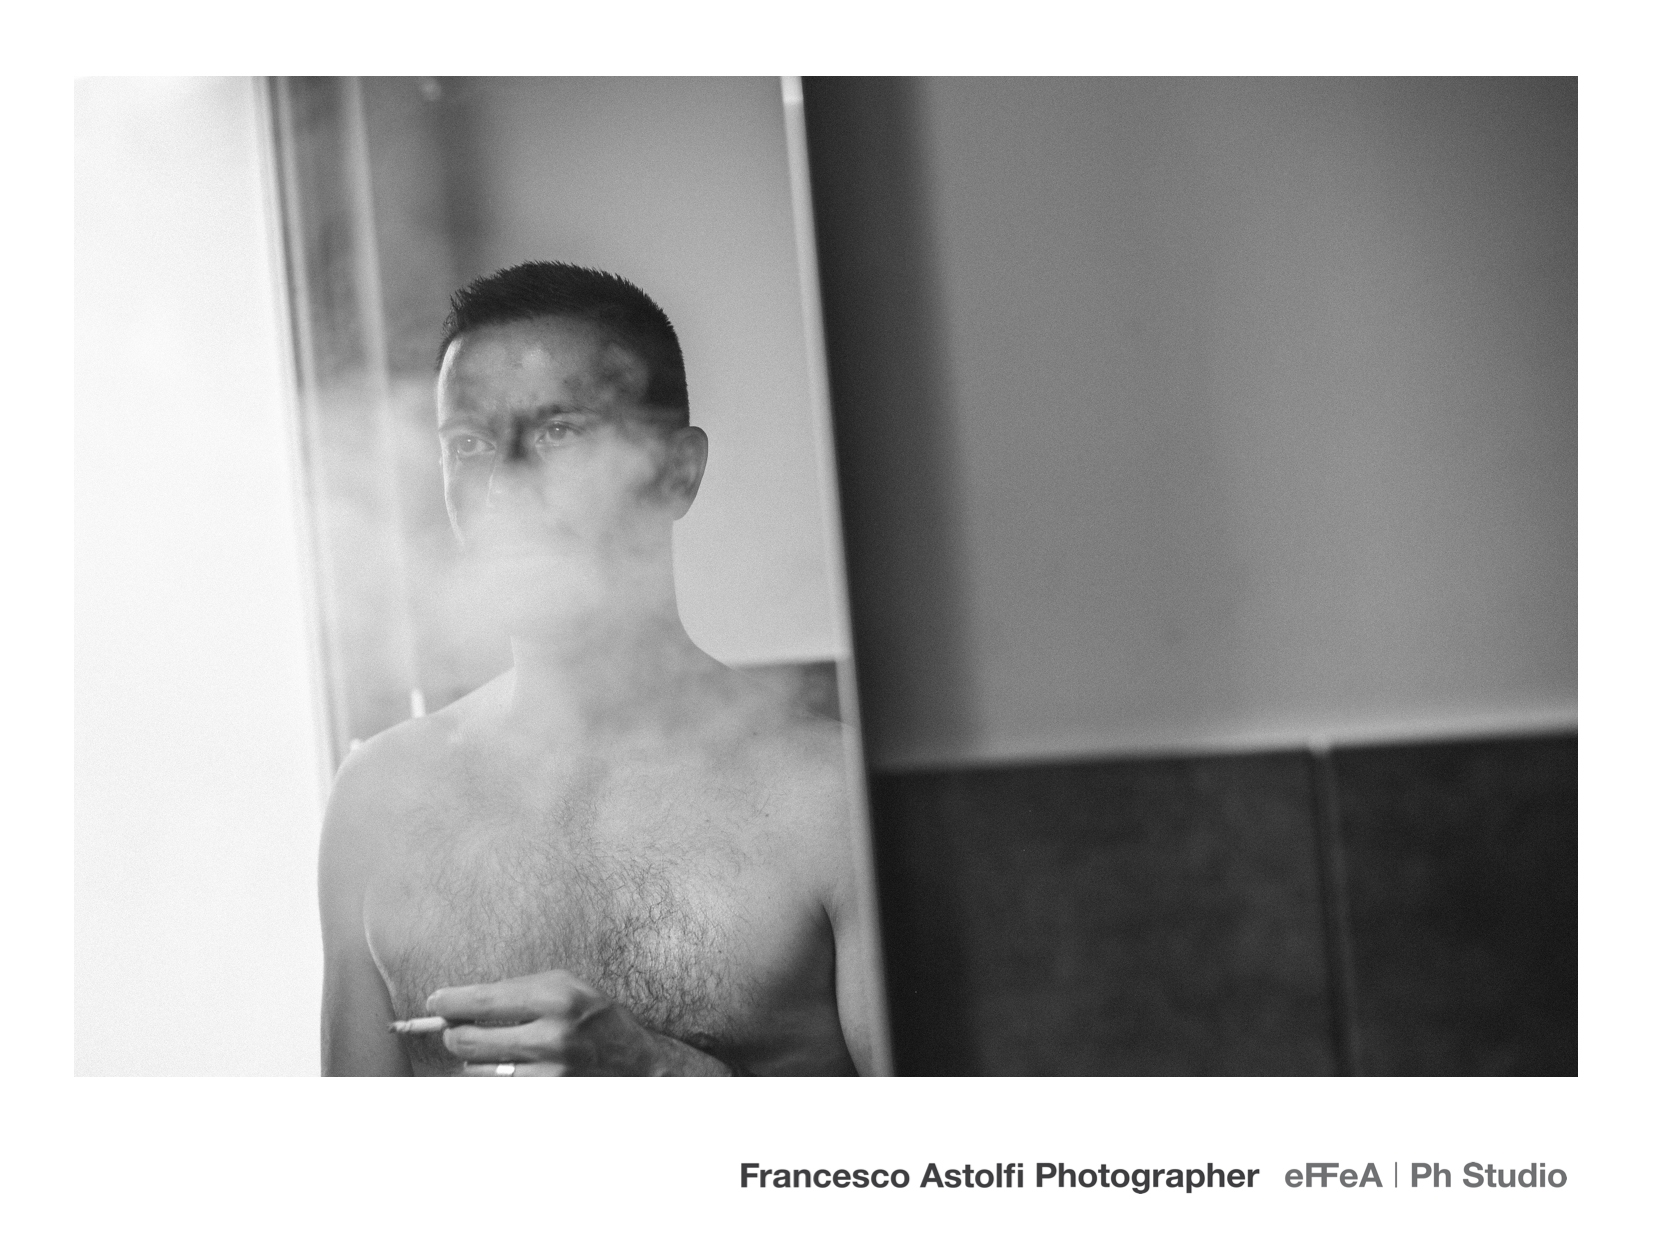 015 - ANDREA S. - Photo by Francesco Astolfi